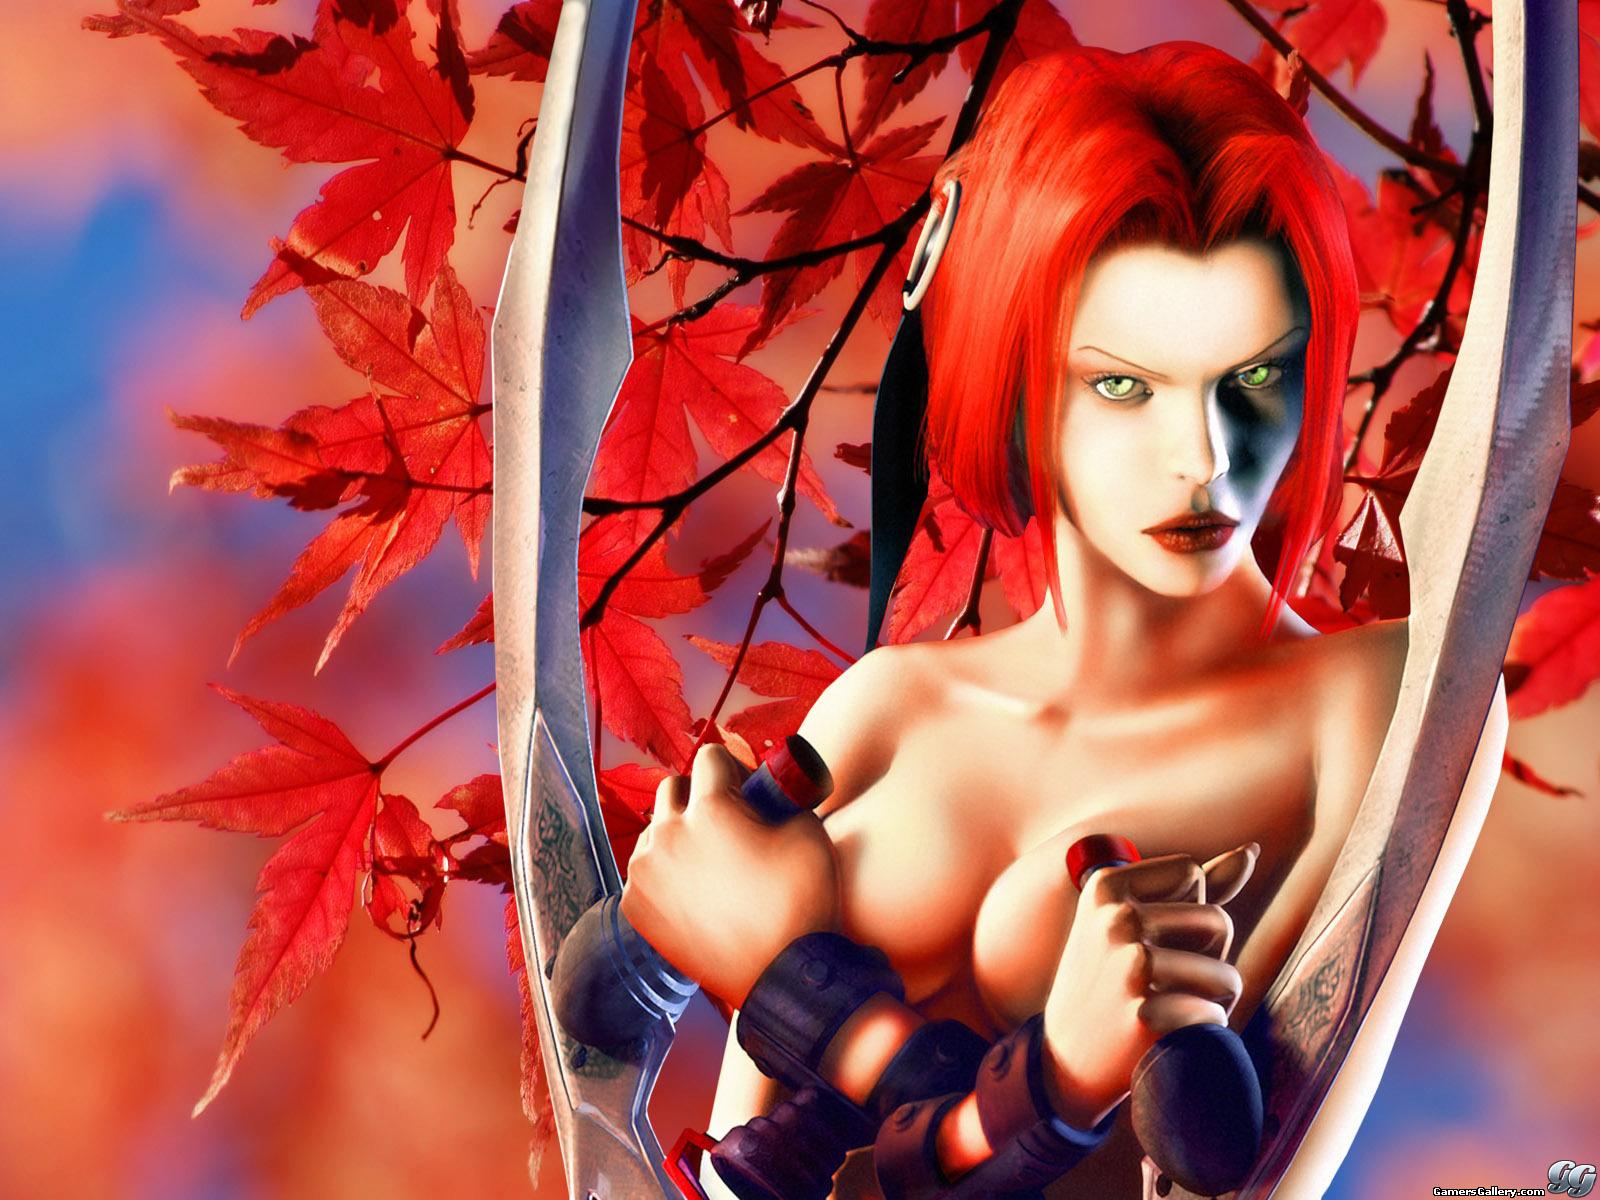 Blood elf lesbian sex games sex pic